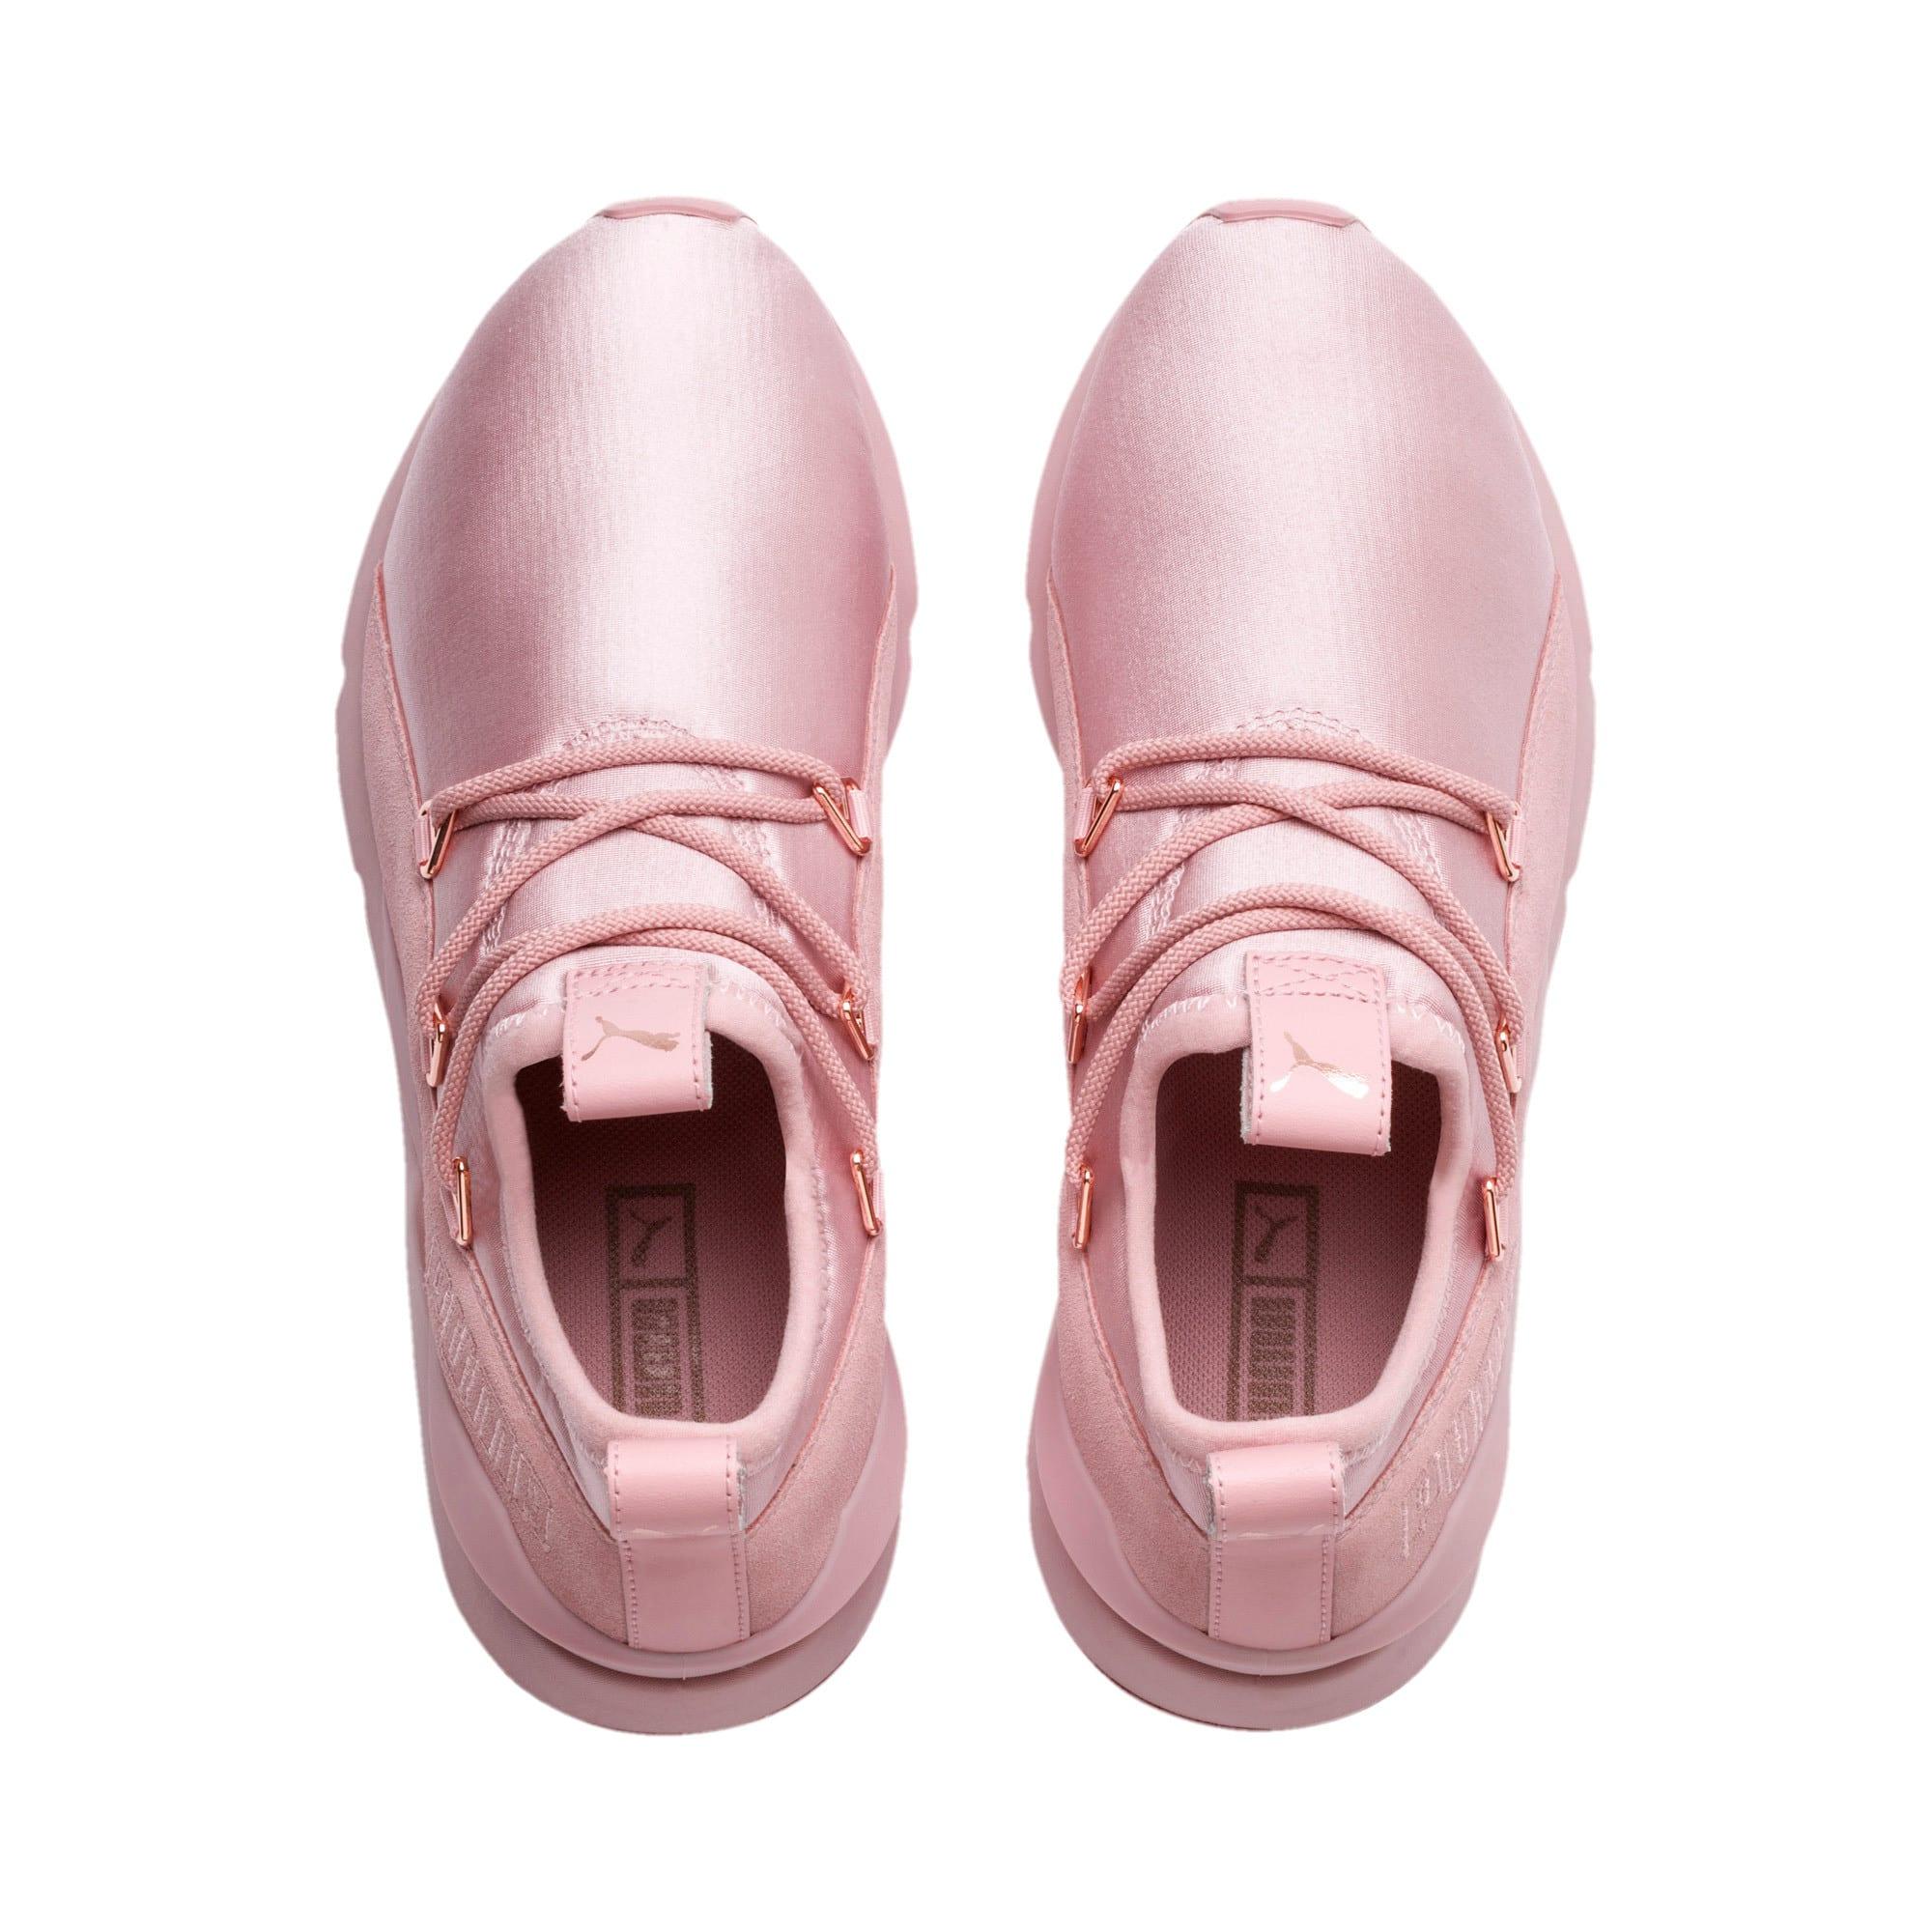 Thumbnail 6 of Muse 2 Women's Sneakers, Bridal Rose-Bridal Rose, medium